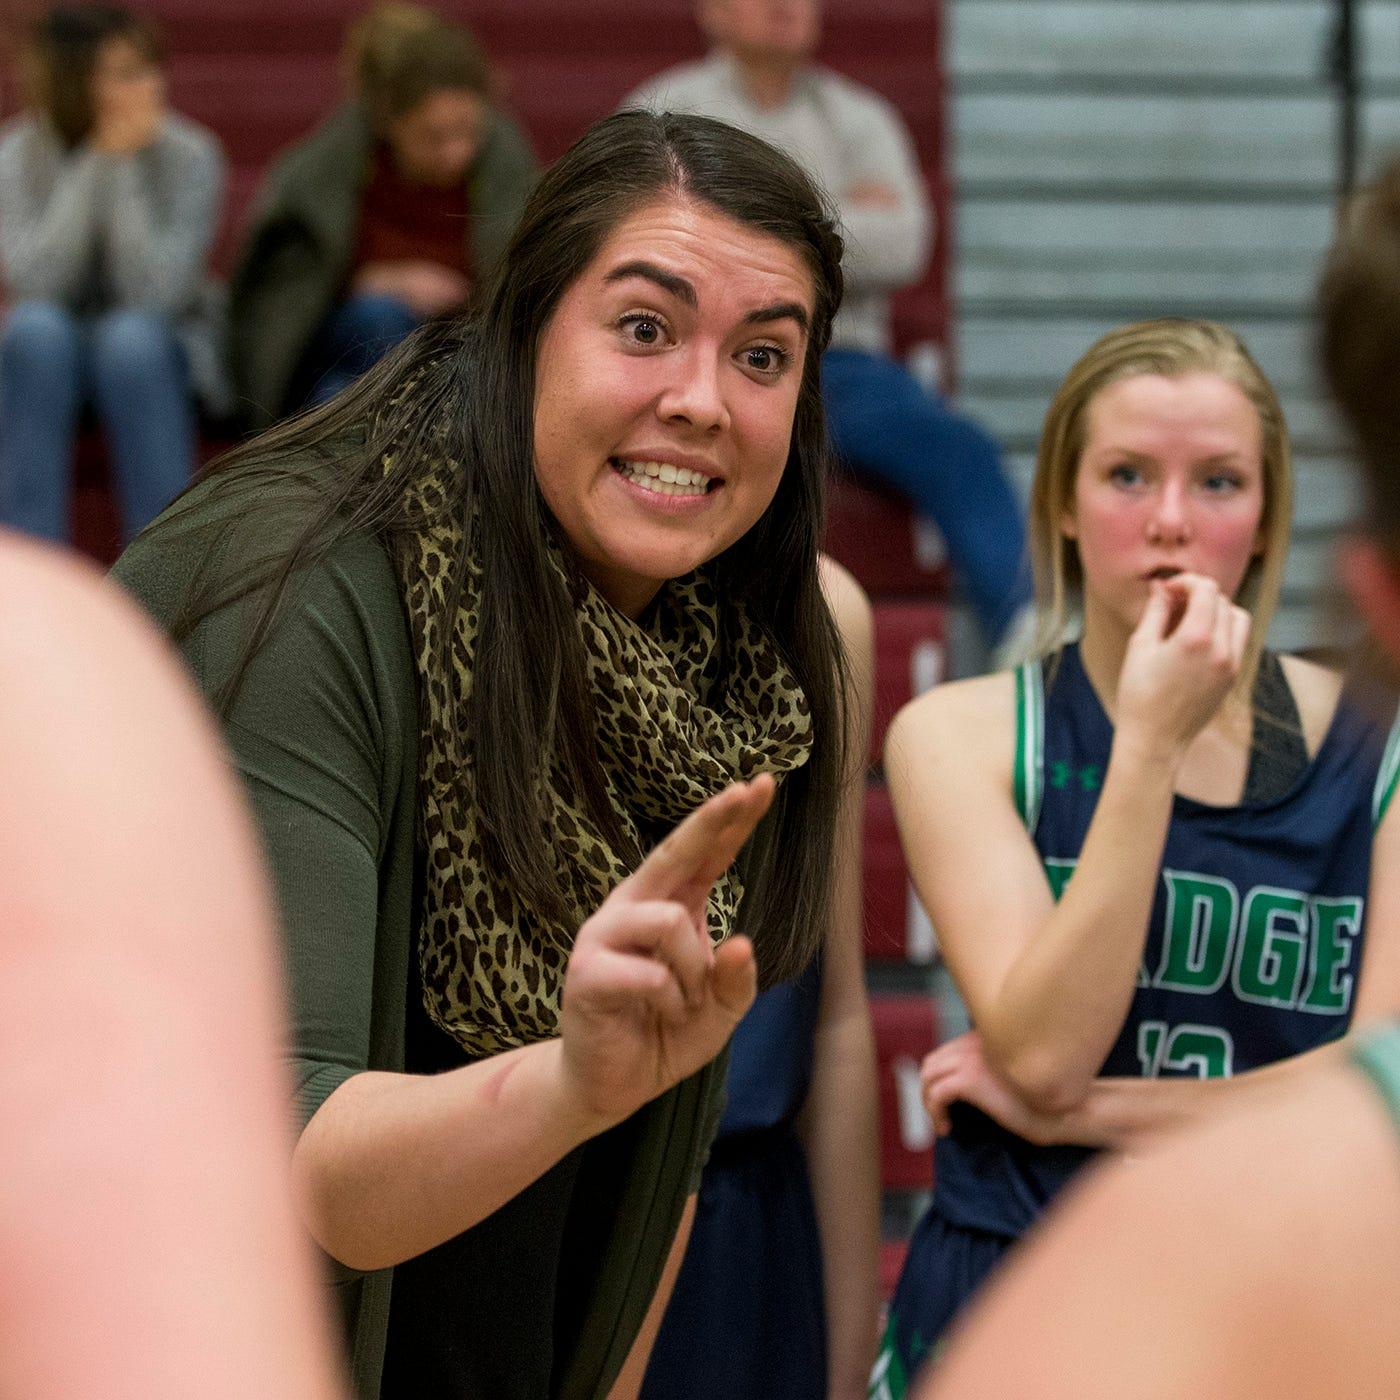 Former CSU basketball star providing role model for female athletes as a high school coach